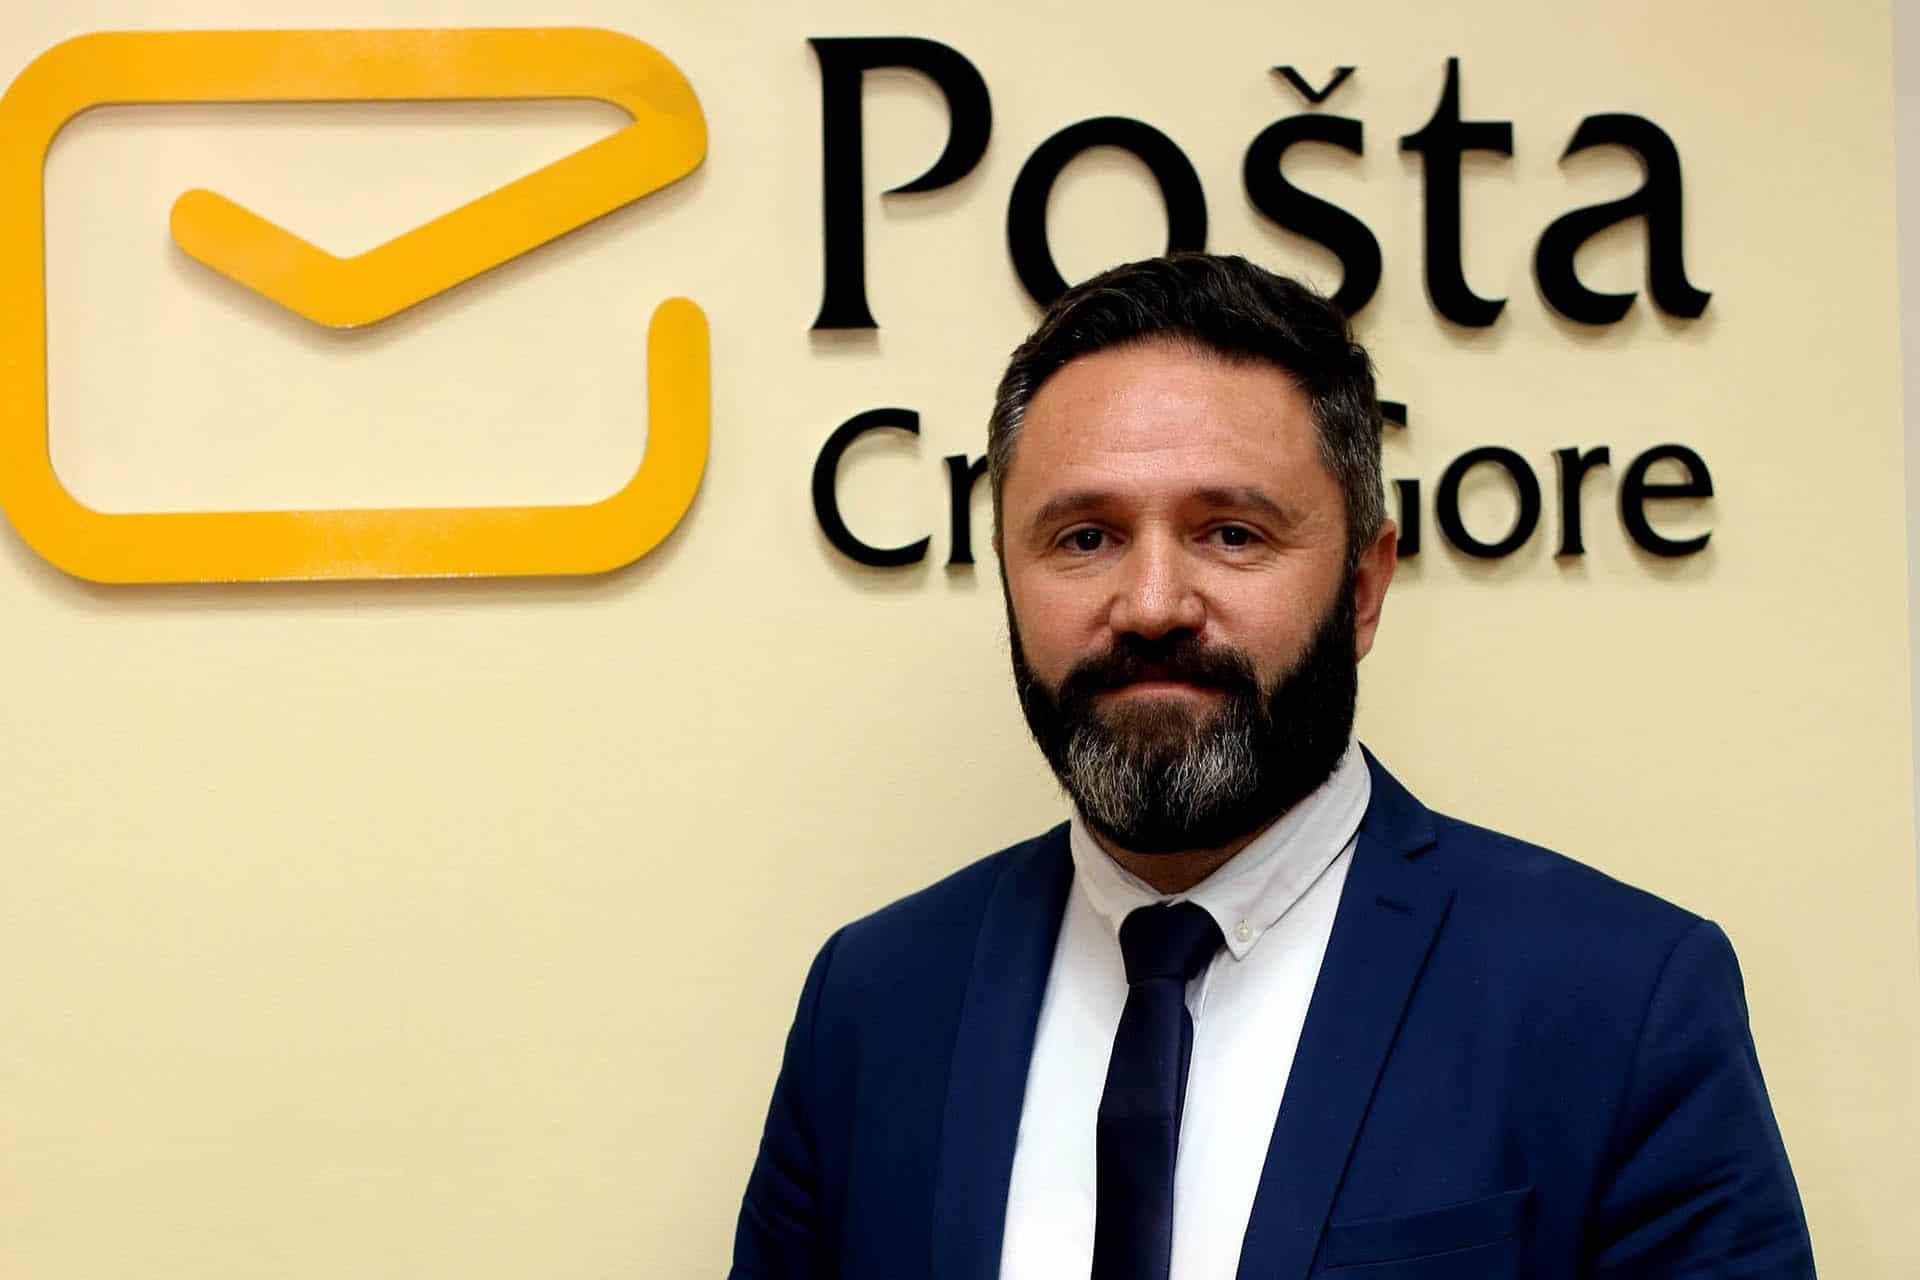 Čestitka Izvršnog direktora Pošte Crne Gore Dragana Tufegdžića povodom predstojećih praznika